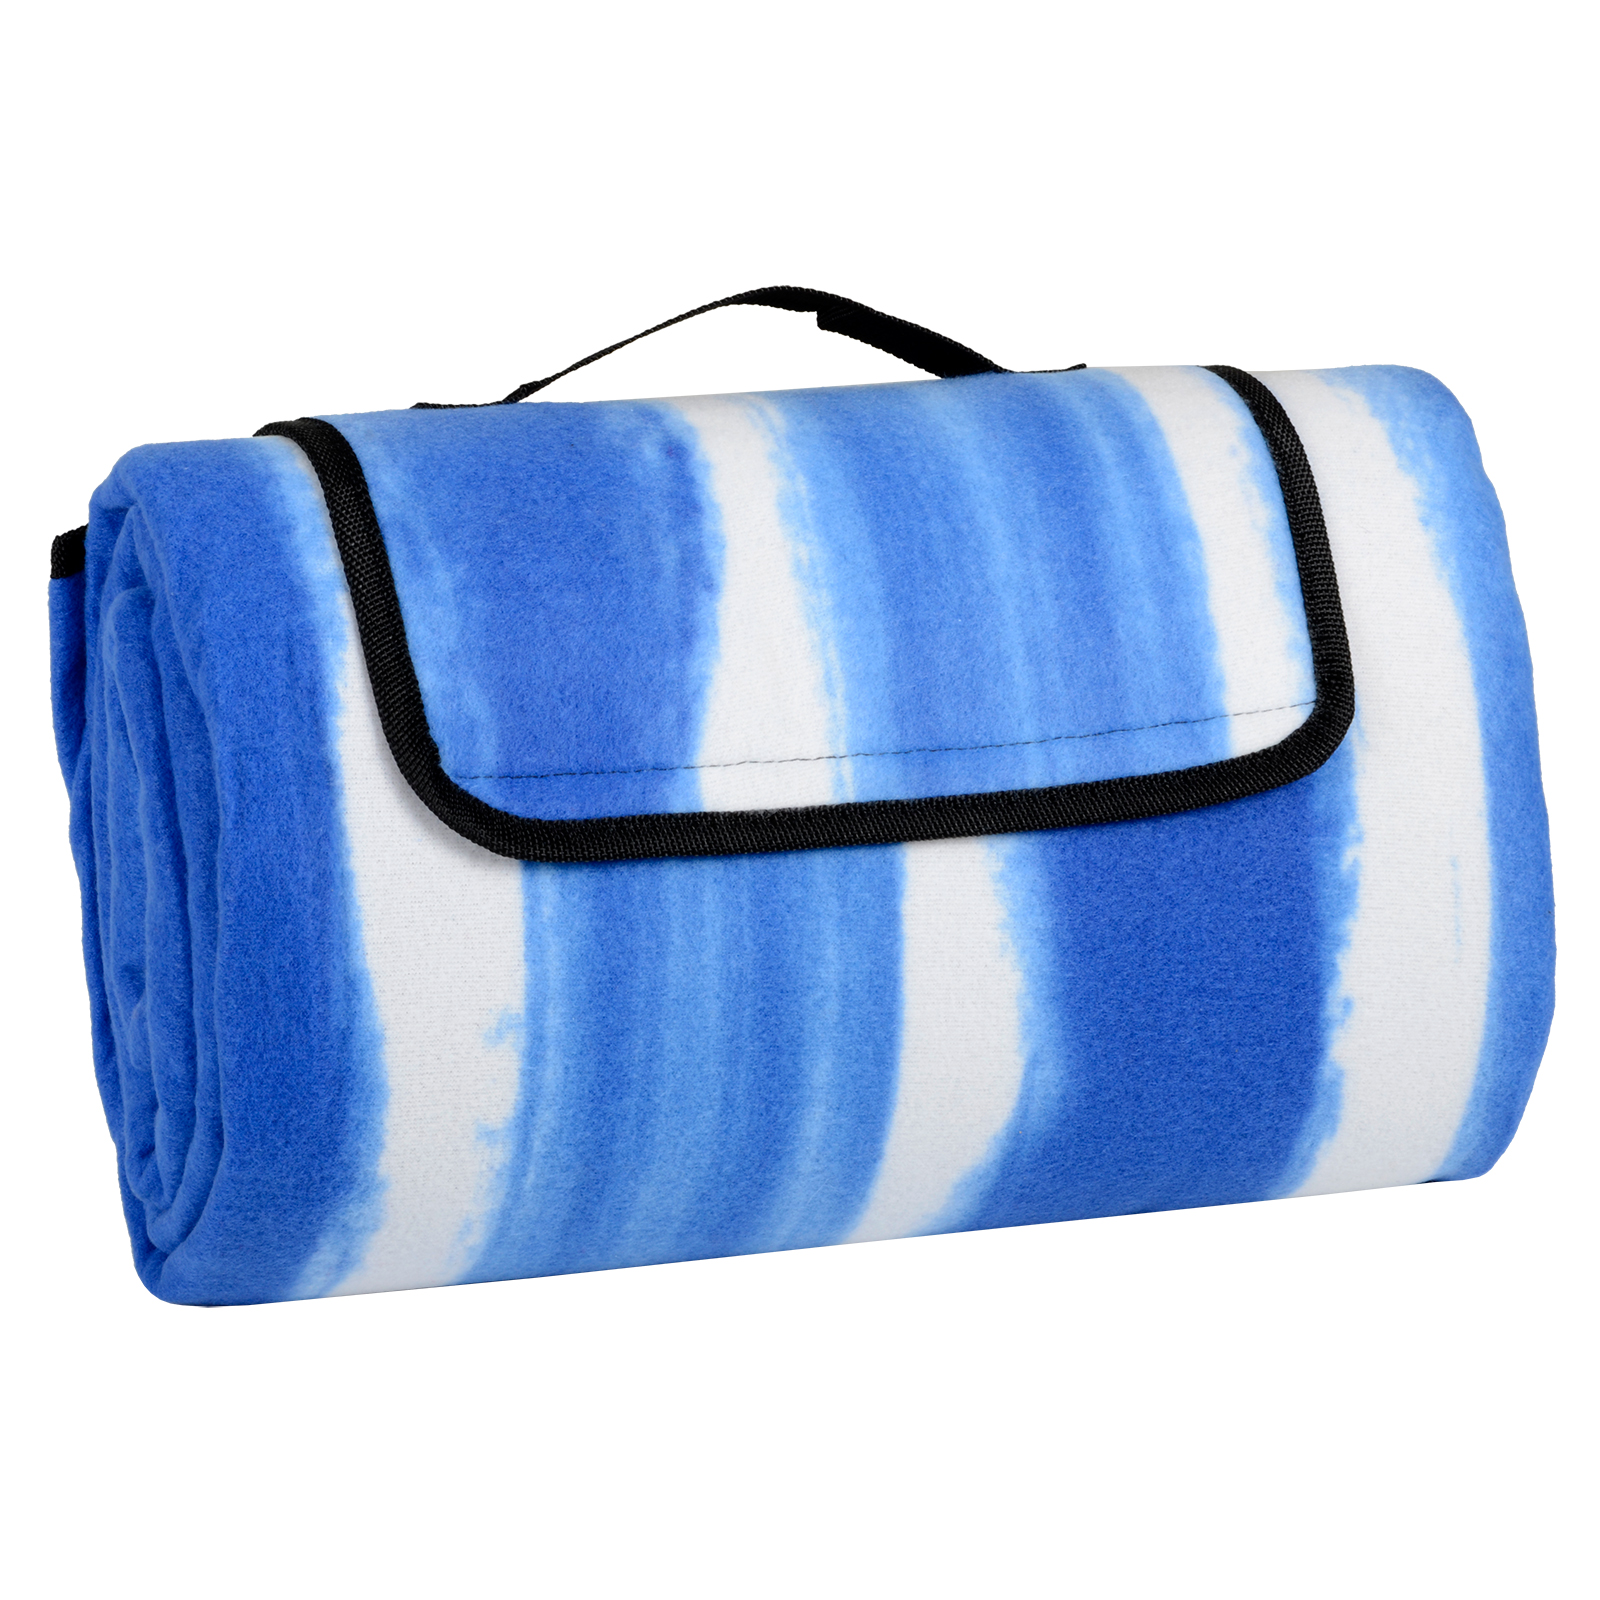 "New 59x51"" Outdoor Waterproof Picnic Blanket Beach Mat"